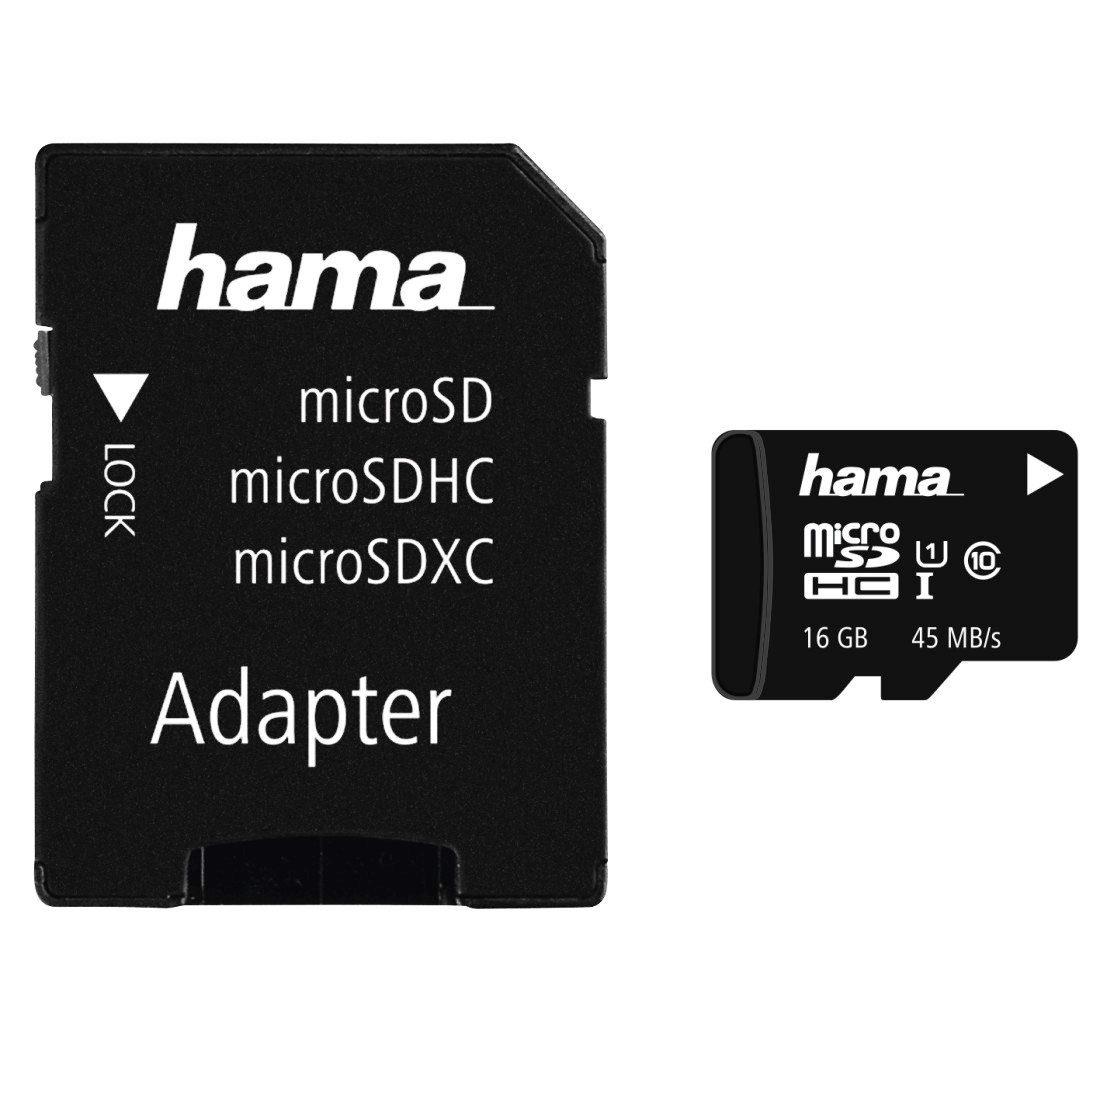 Hama Speicherkarte microSDHC 16GB Class 10 UHS-I »inkl. Adapter auf SD Karte«